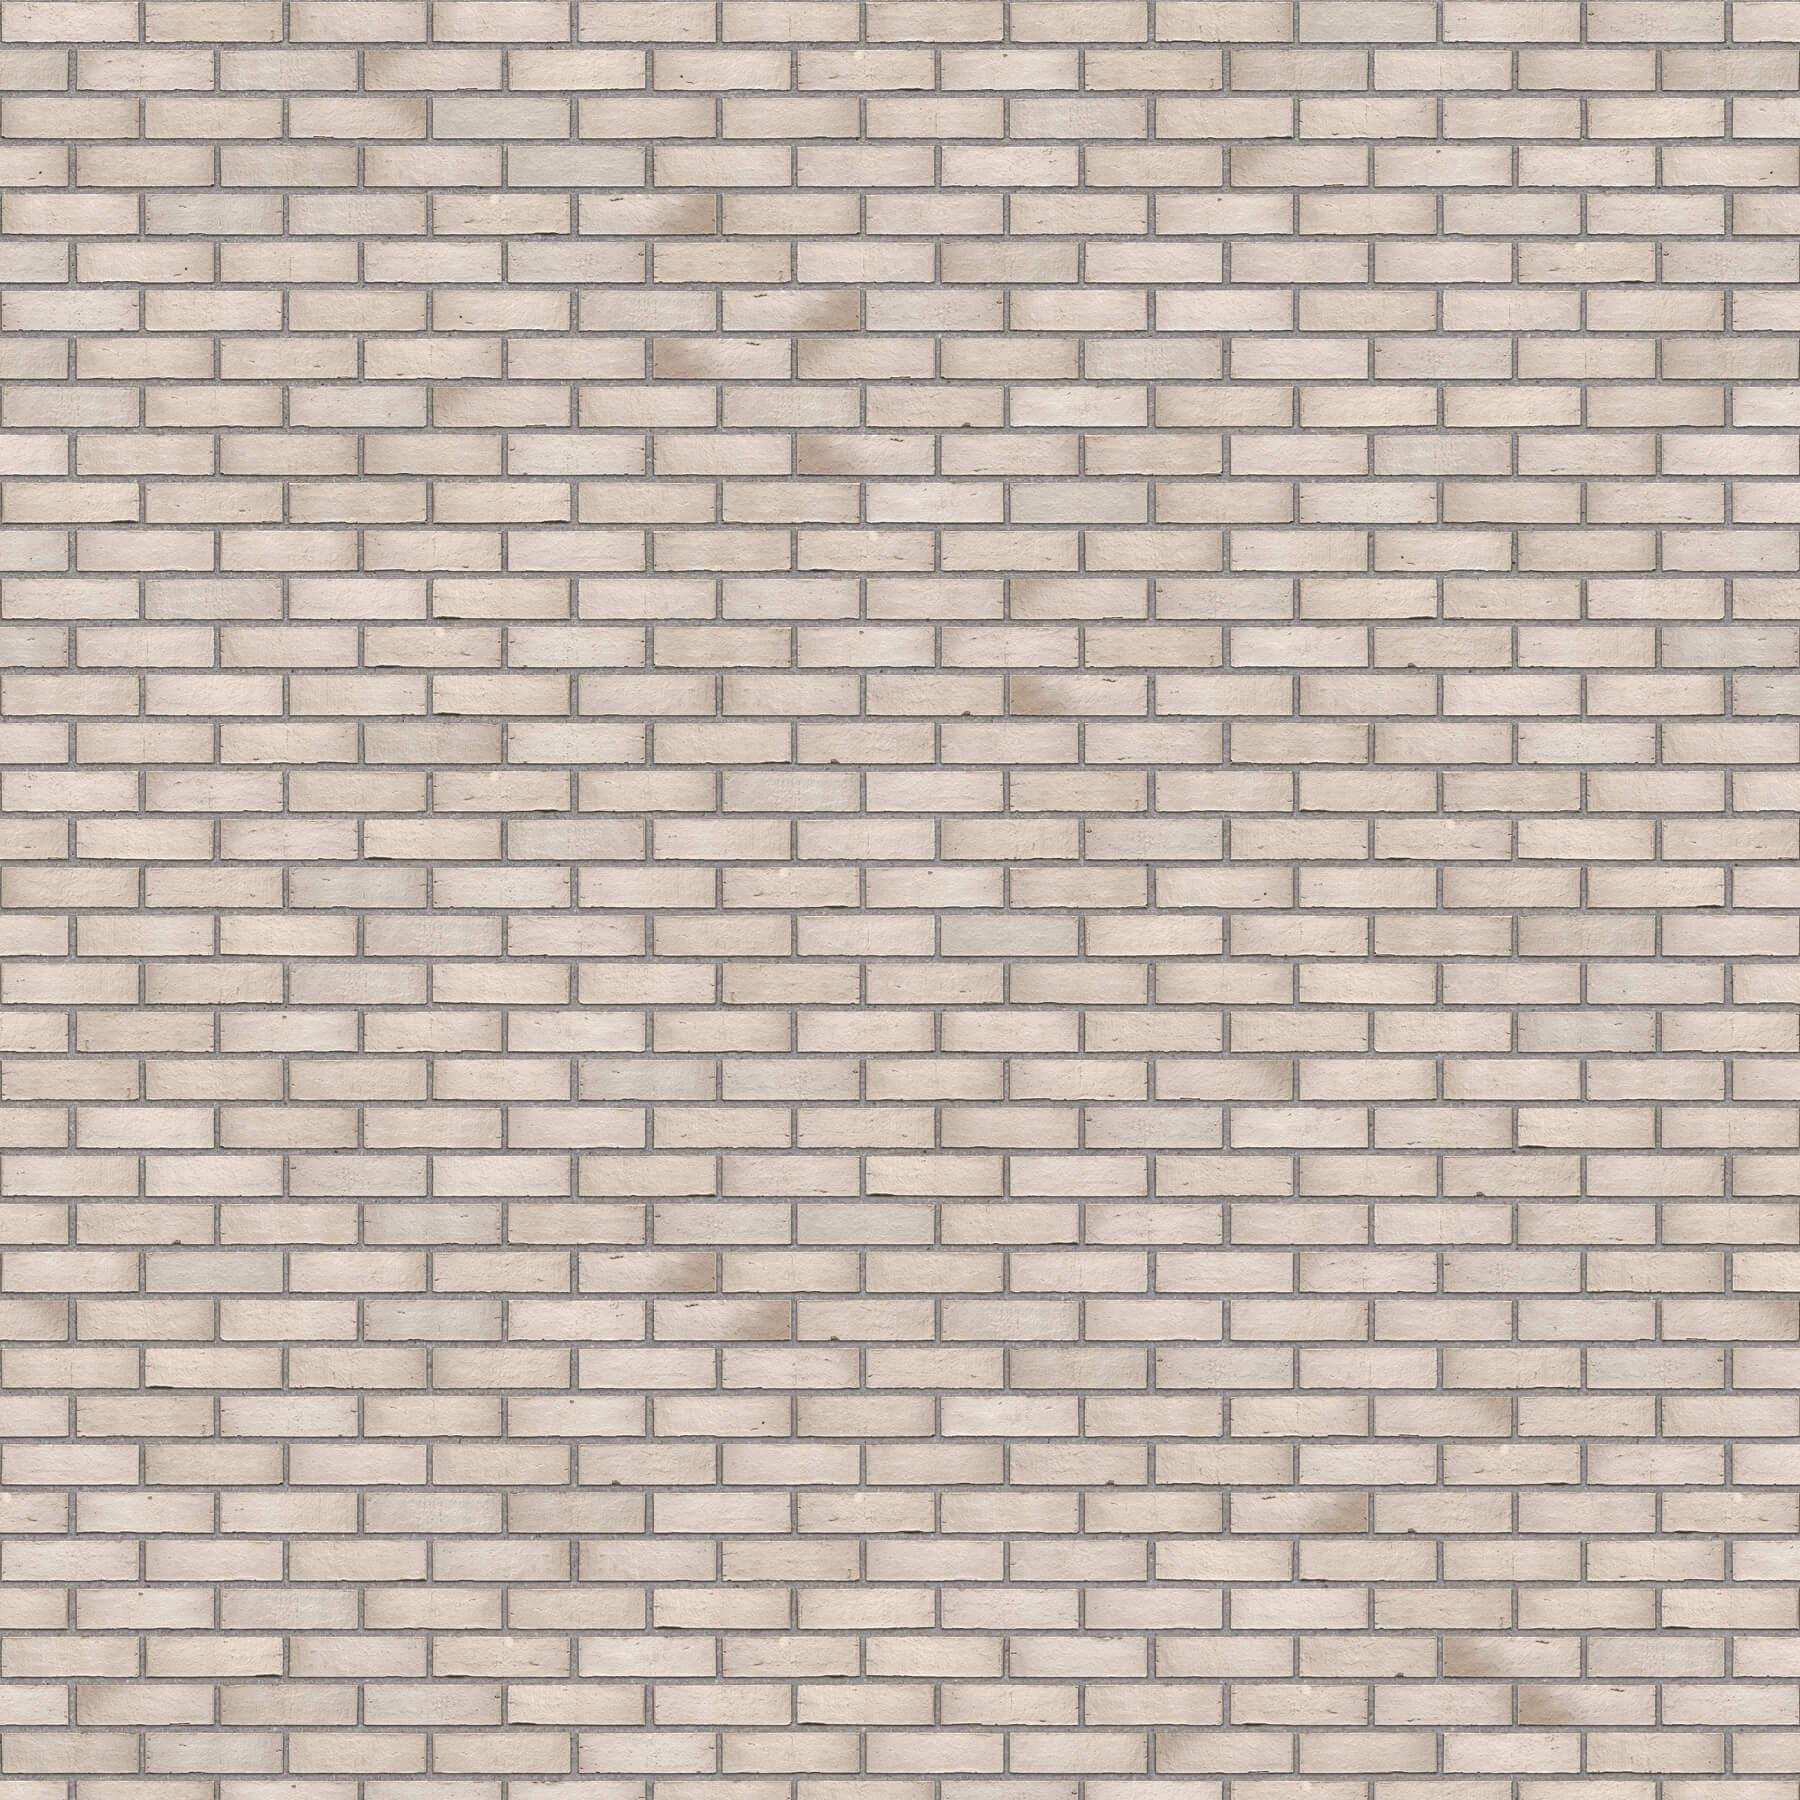 Dekorativna cigla listela FeldHaus Klinker r-941 nf Siva Fuga